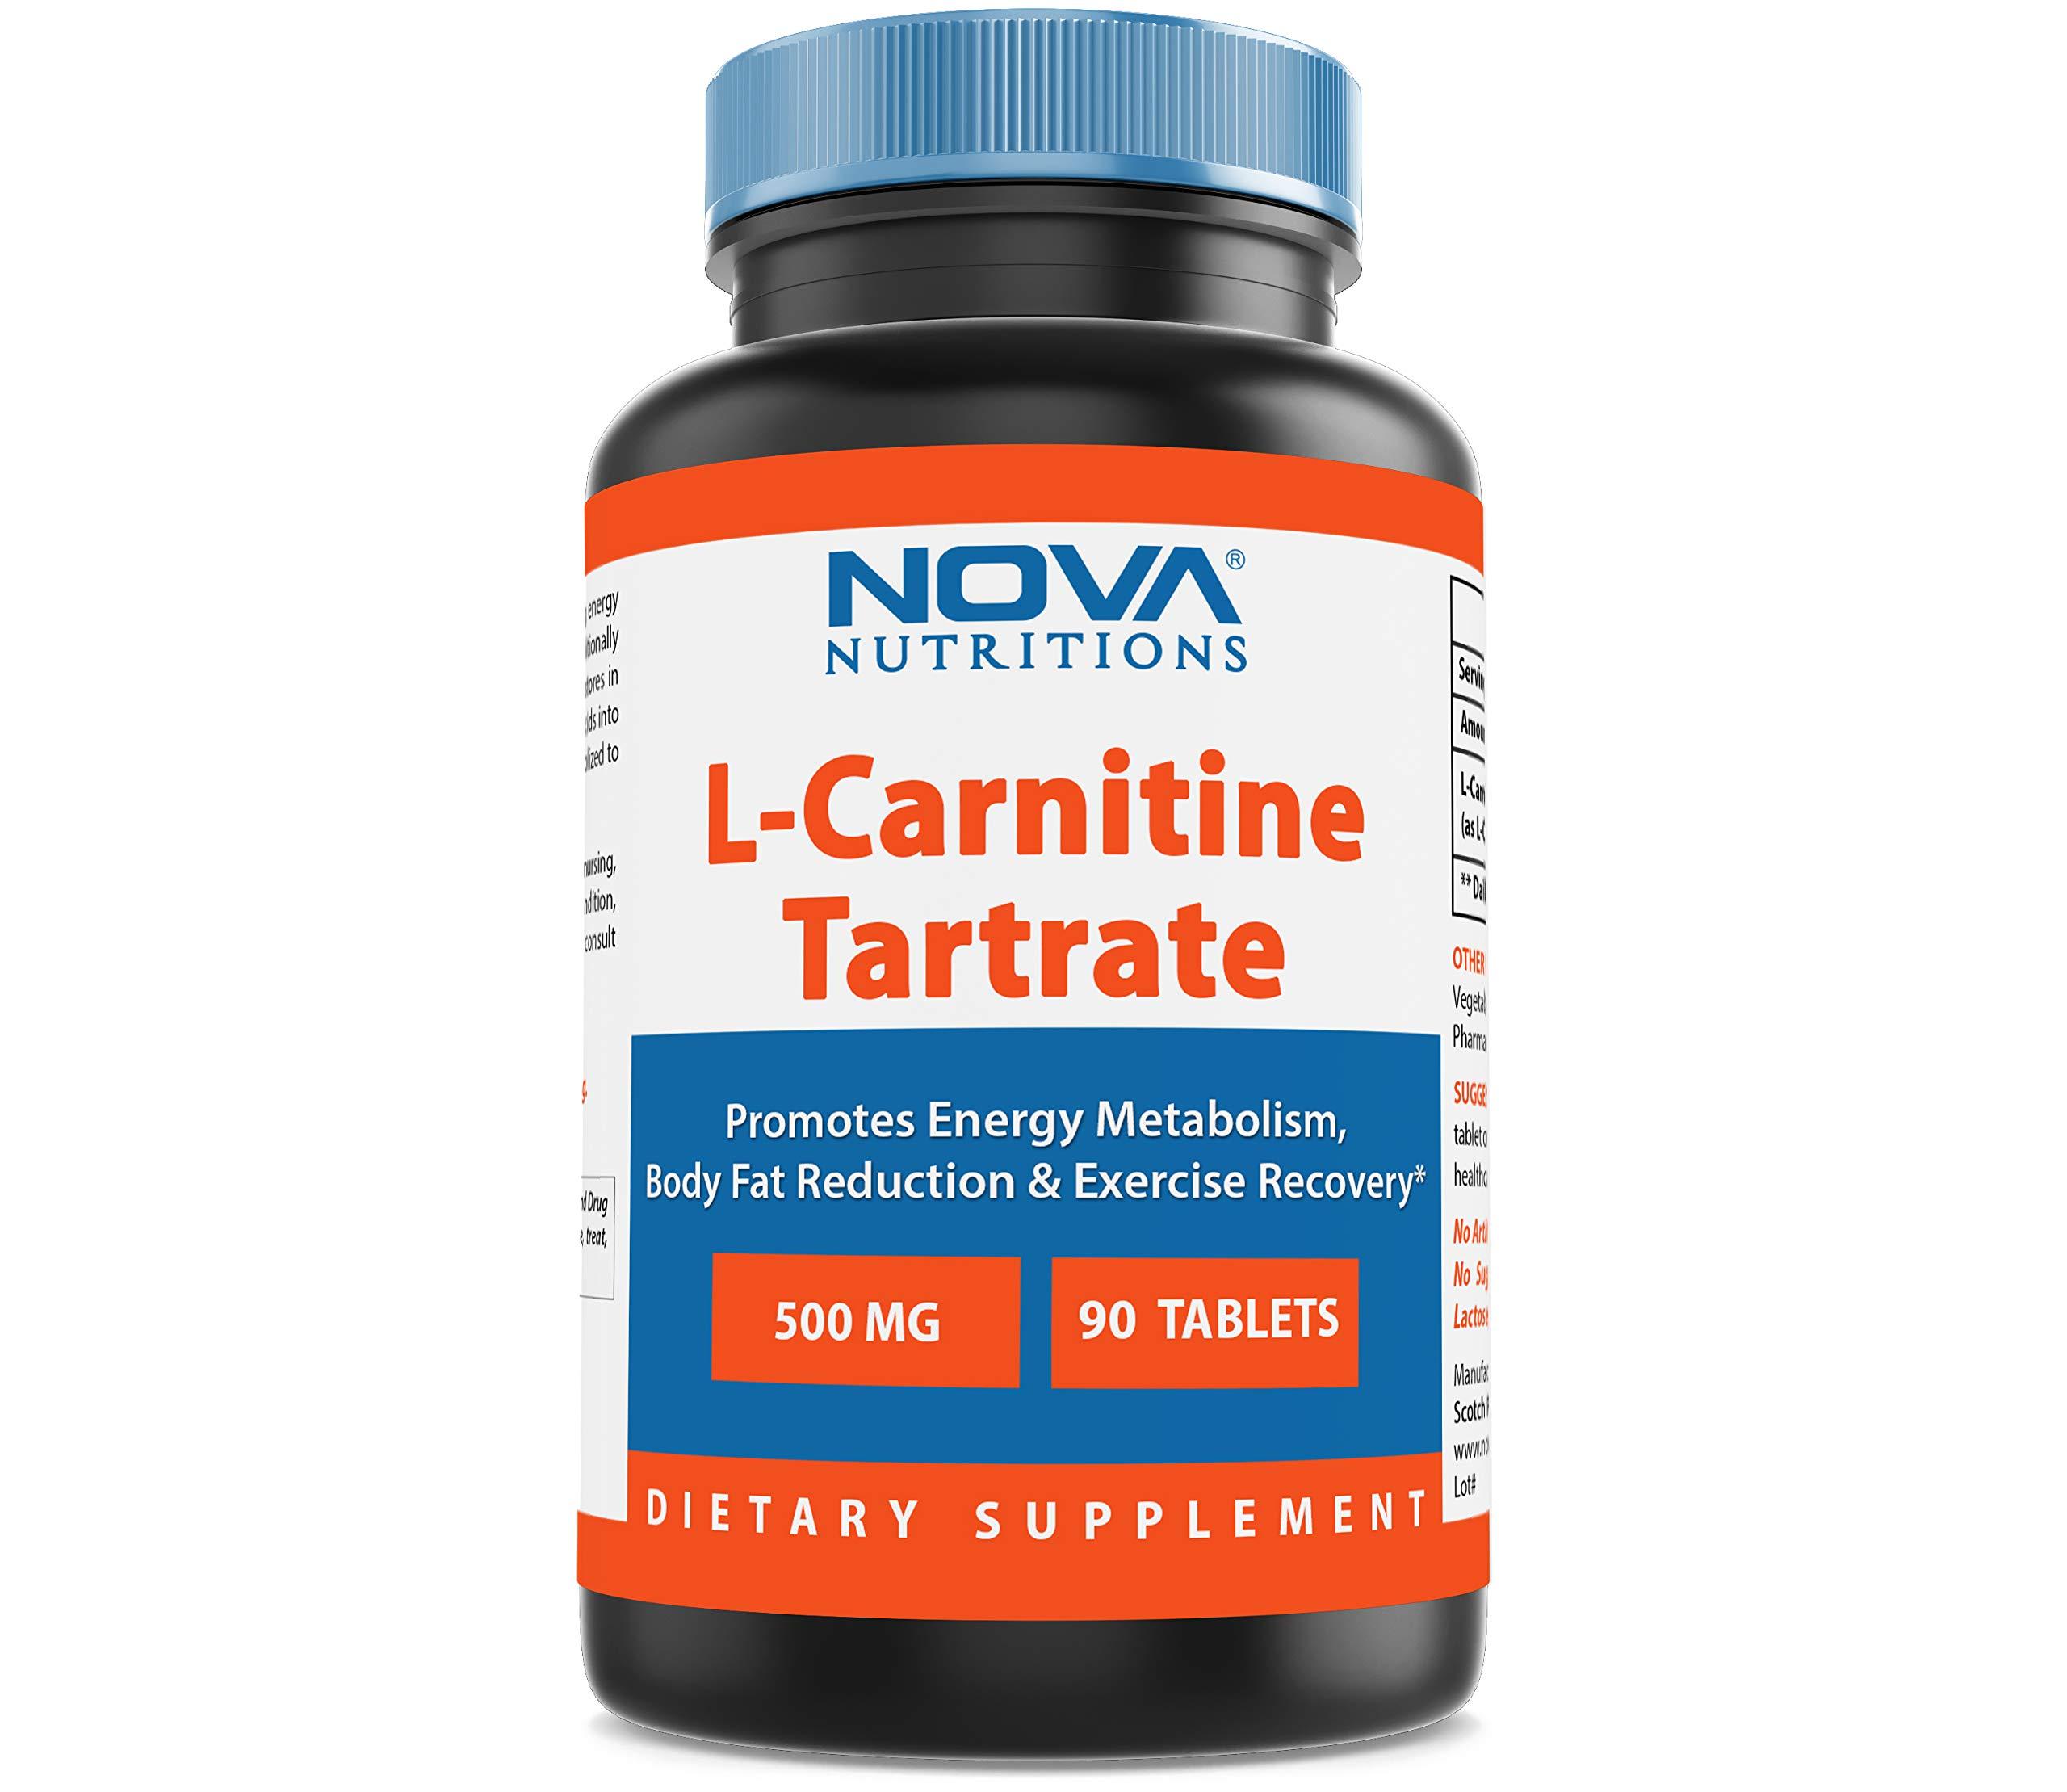 Nova Nutritions L-Carnitine 500 mg 90 Tablets by Nova Nutritions